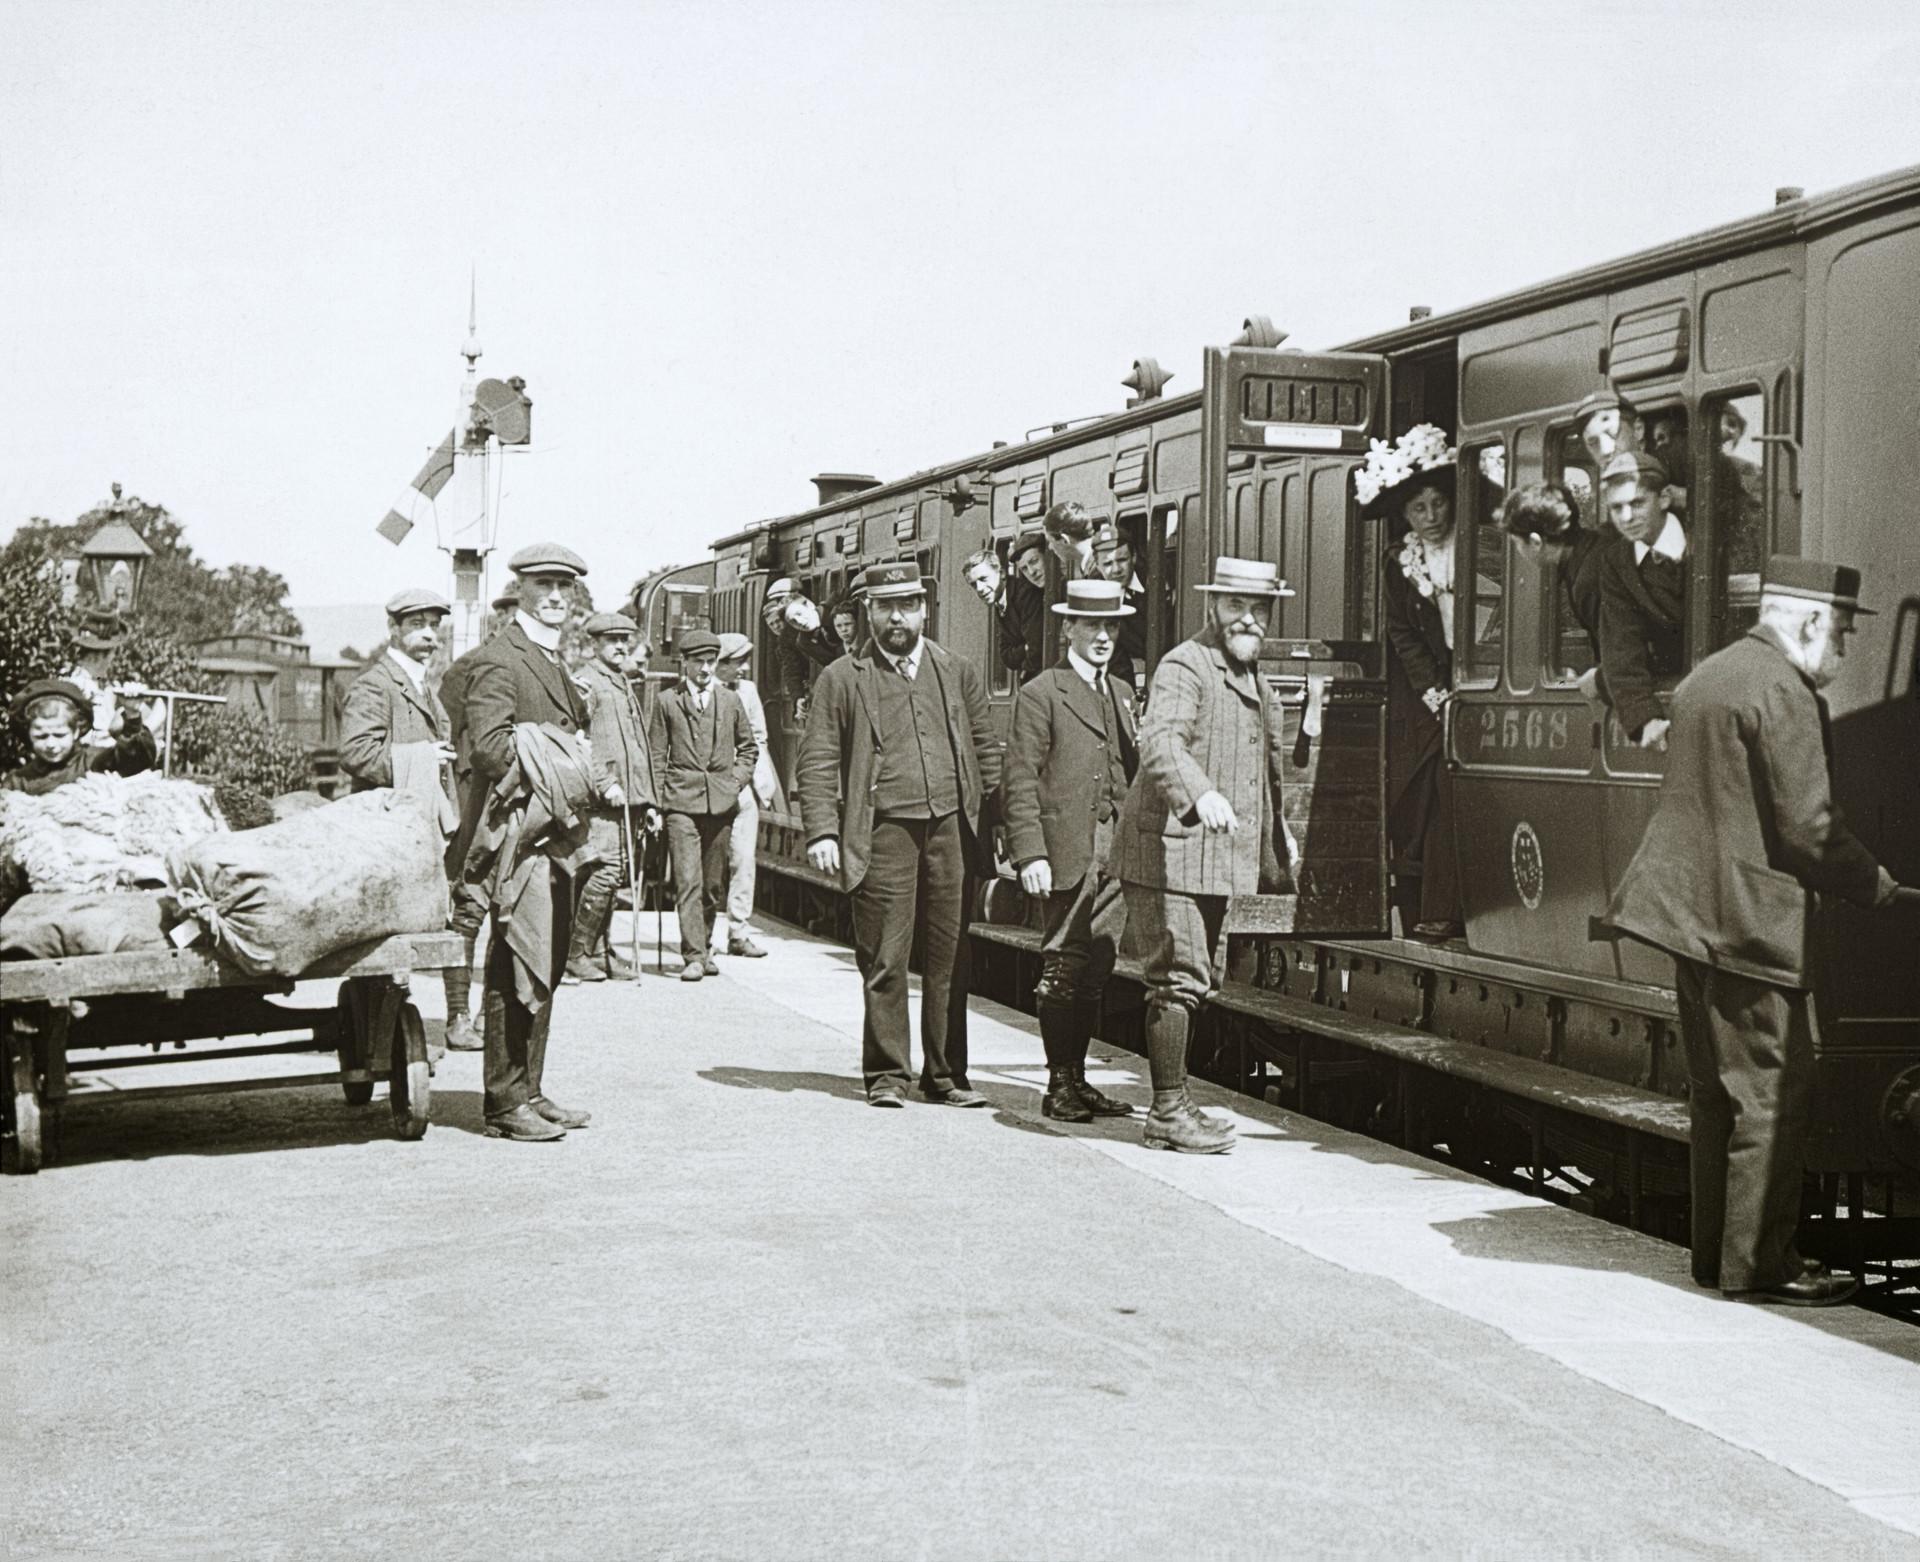 Aysgarth Station, c.1903-06, courtesy of Stephen Musgrave.